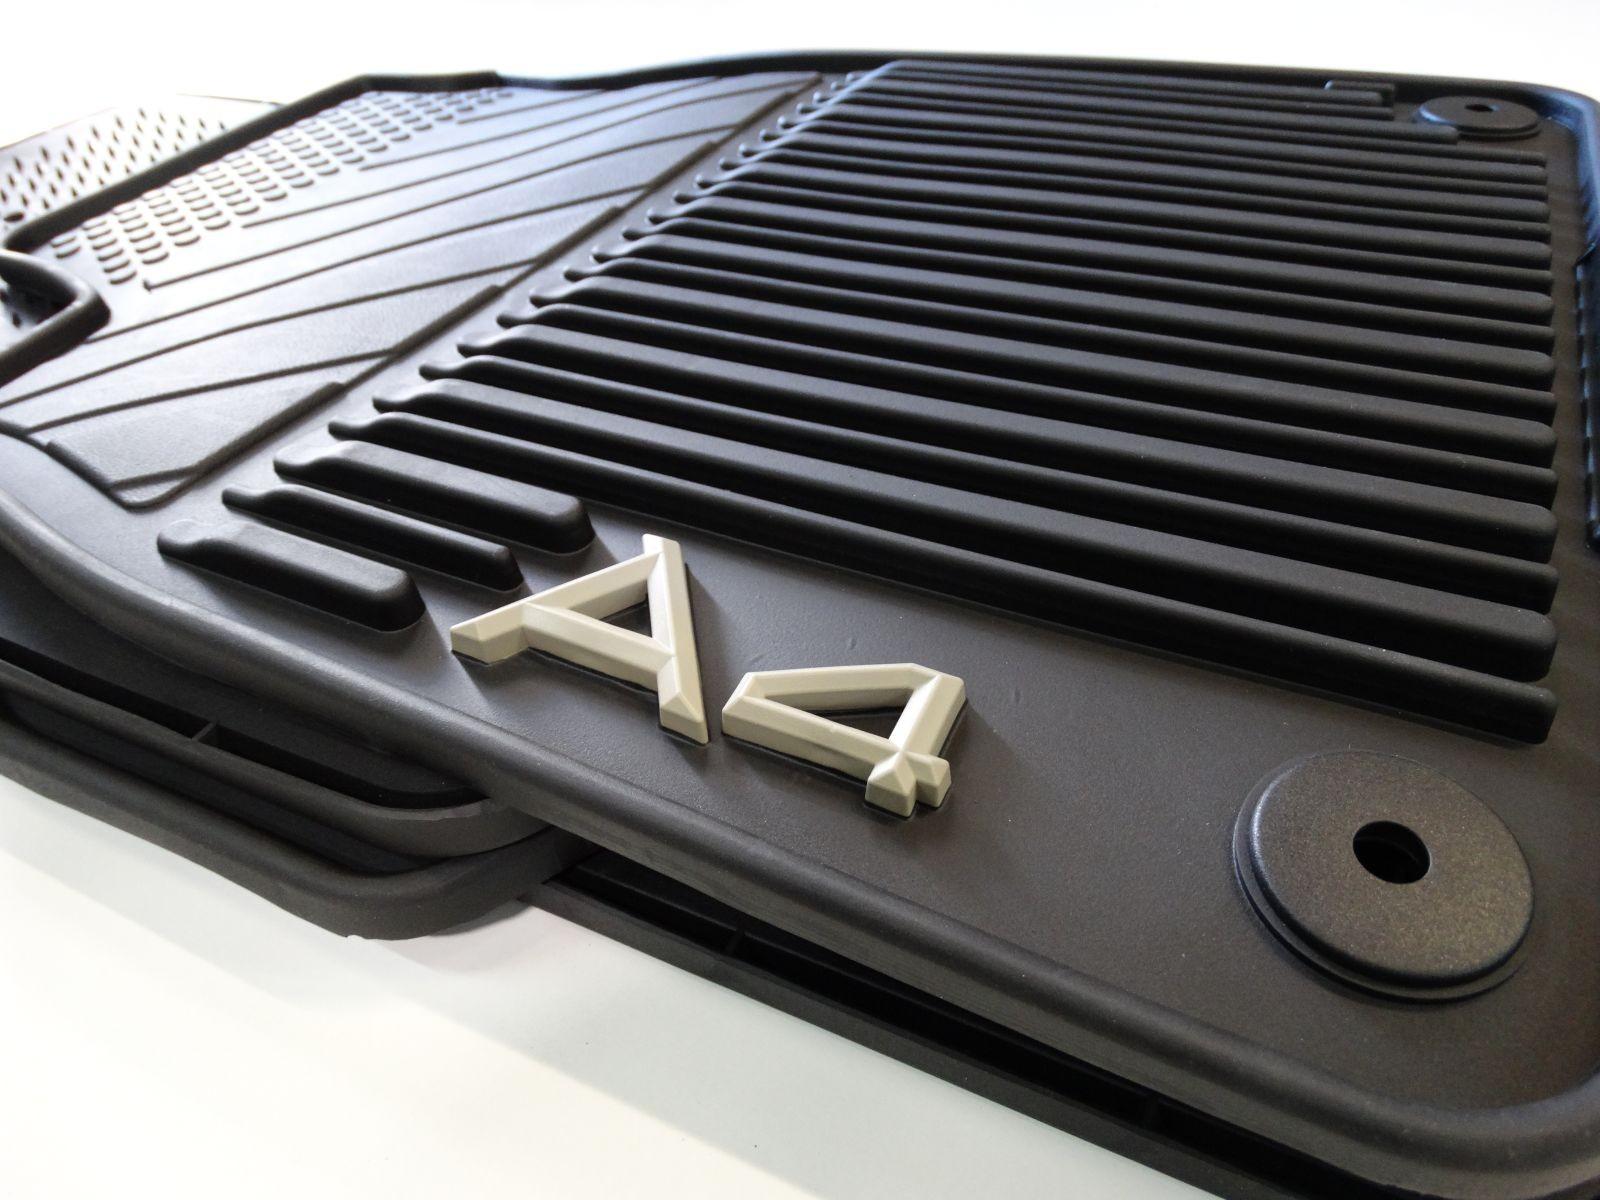 Original Audi Gummimatten vorn und hinten Audi A4 8E S4 Quattro 8E1061225 041